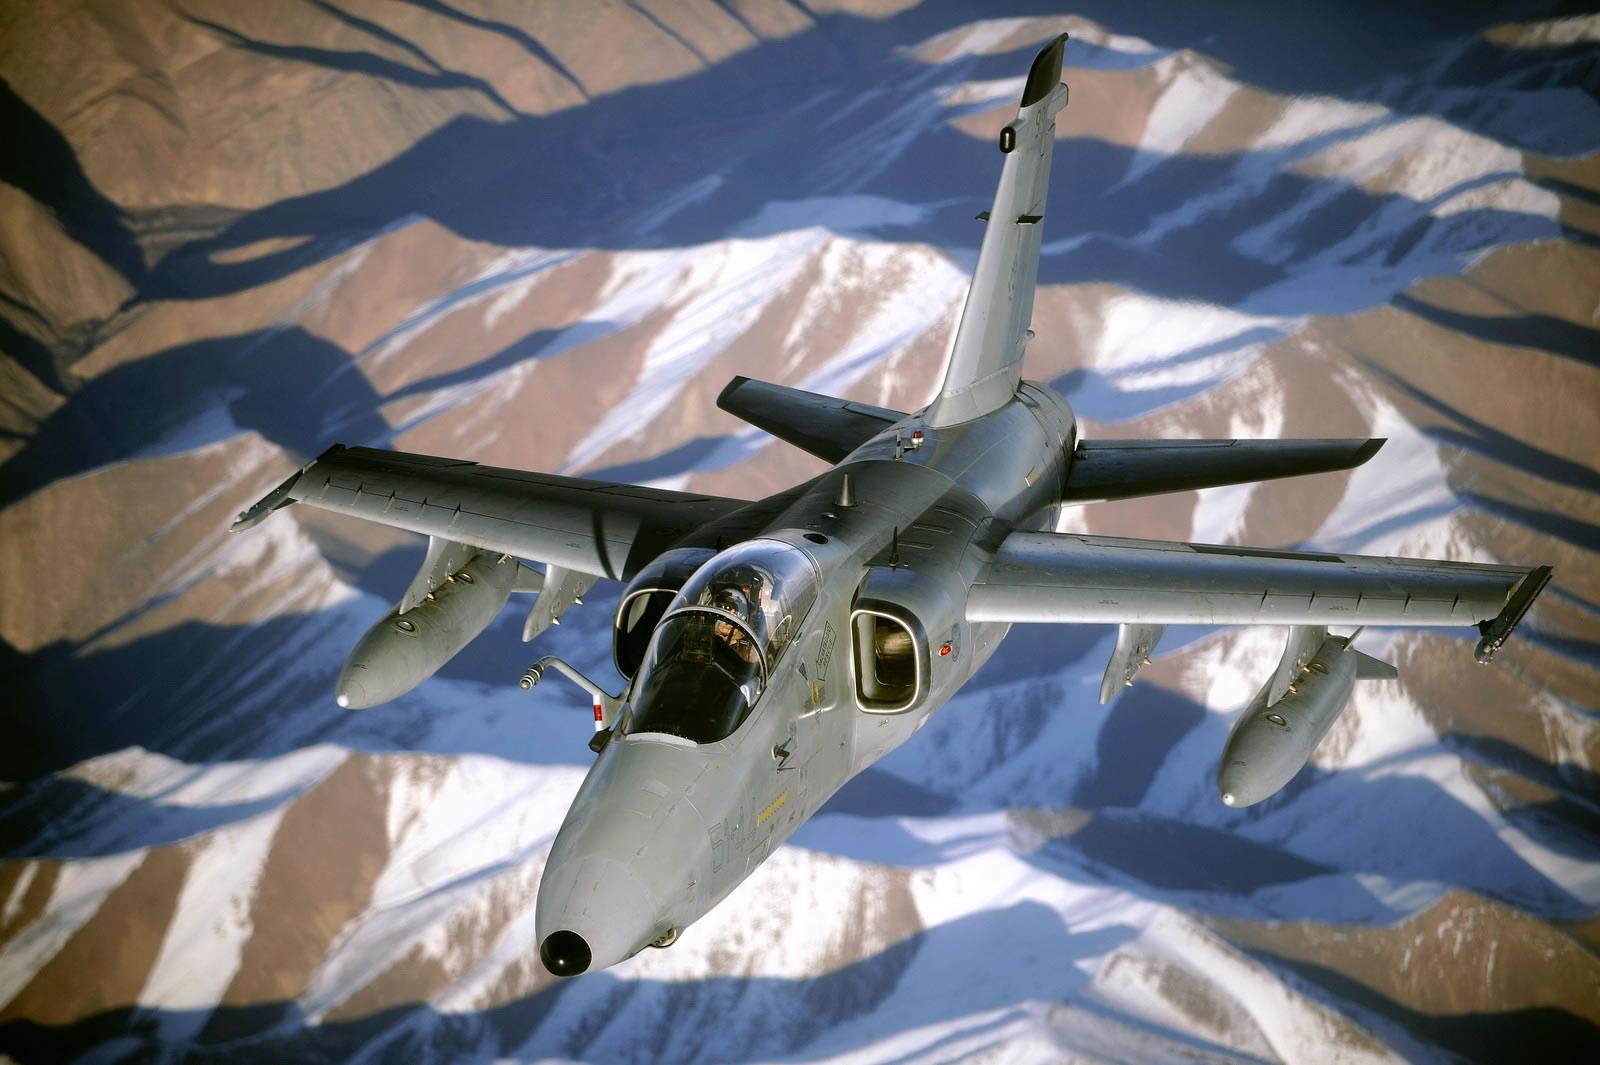 https://i1.wp.com/www.aircraftinformation.info/Images/AMX_04.jpg